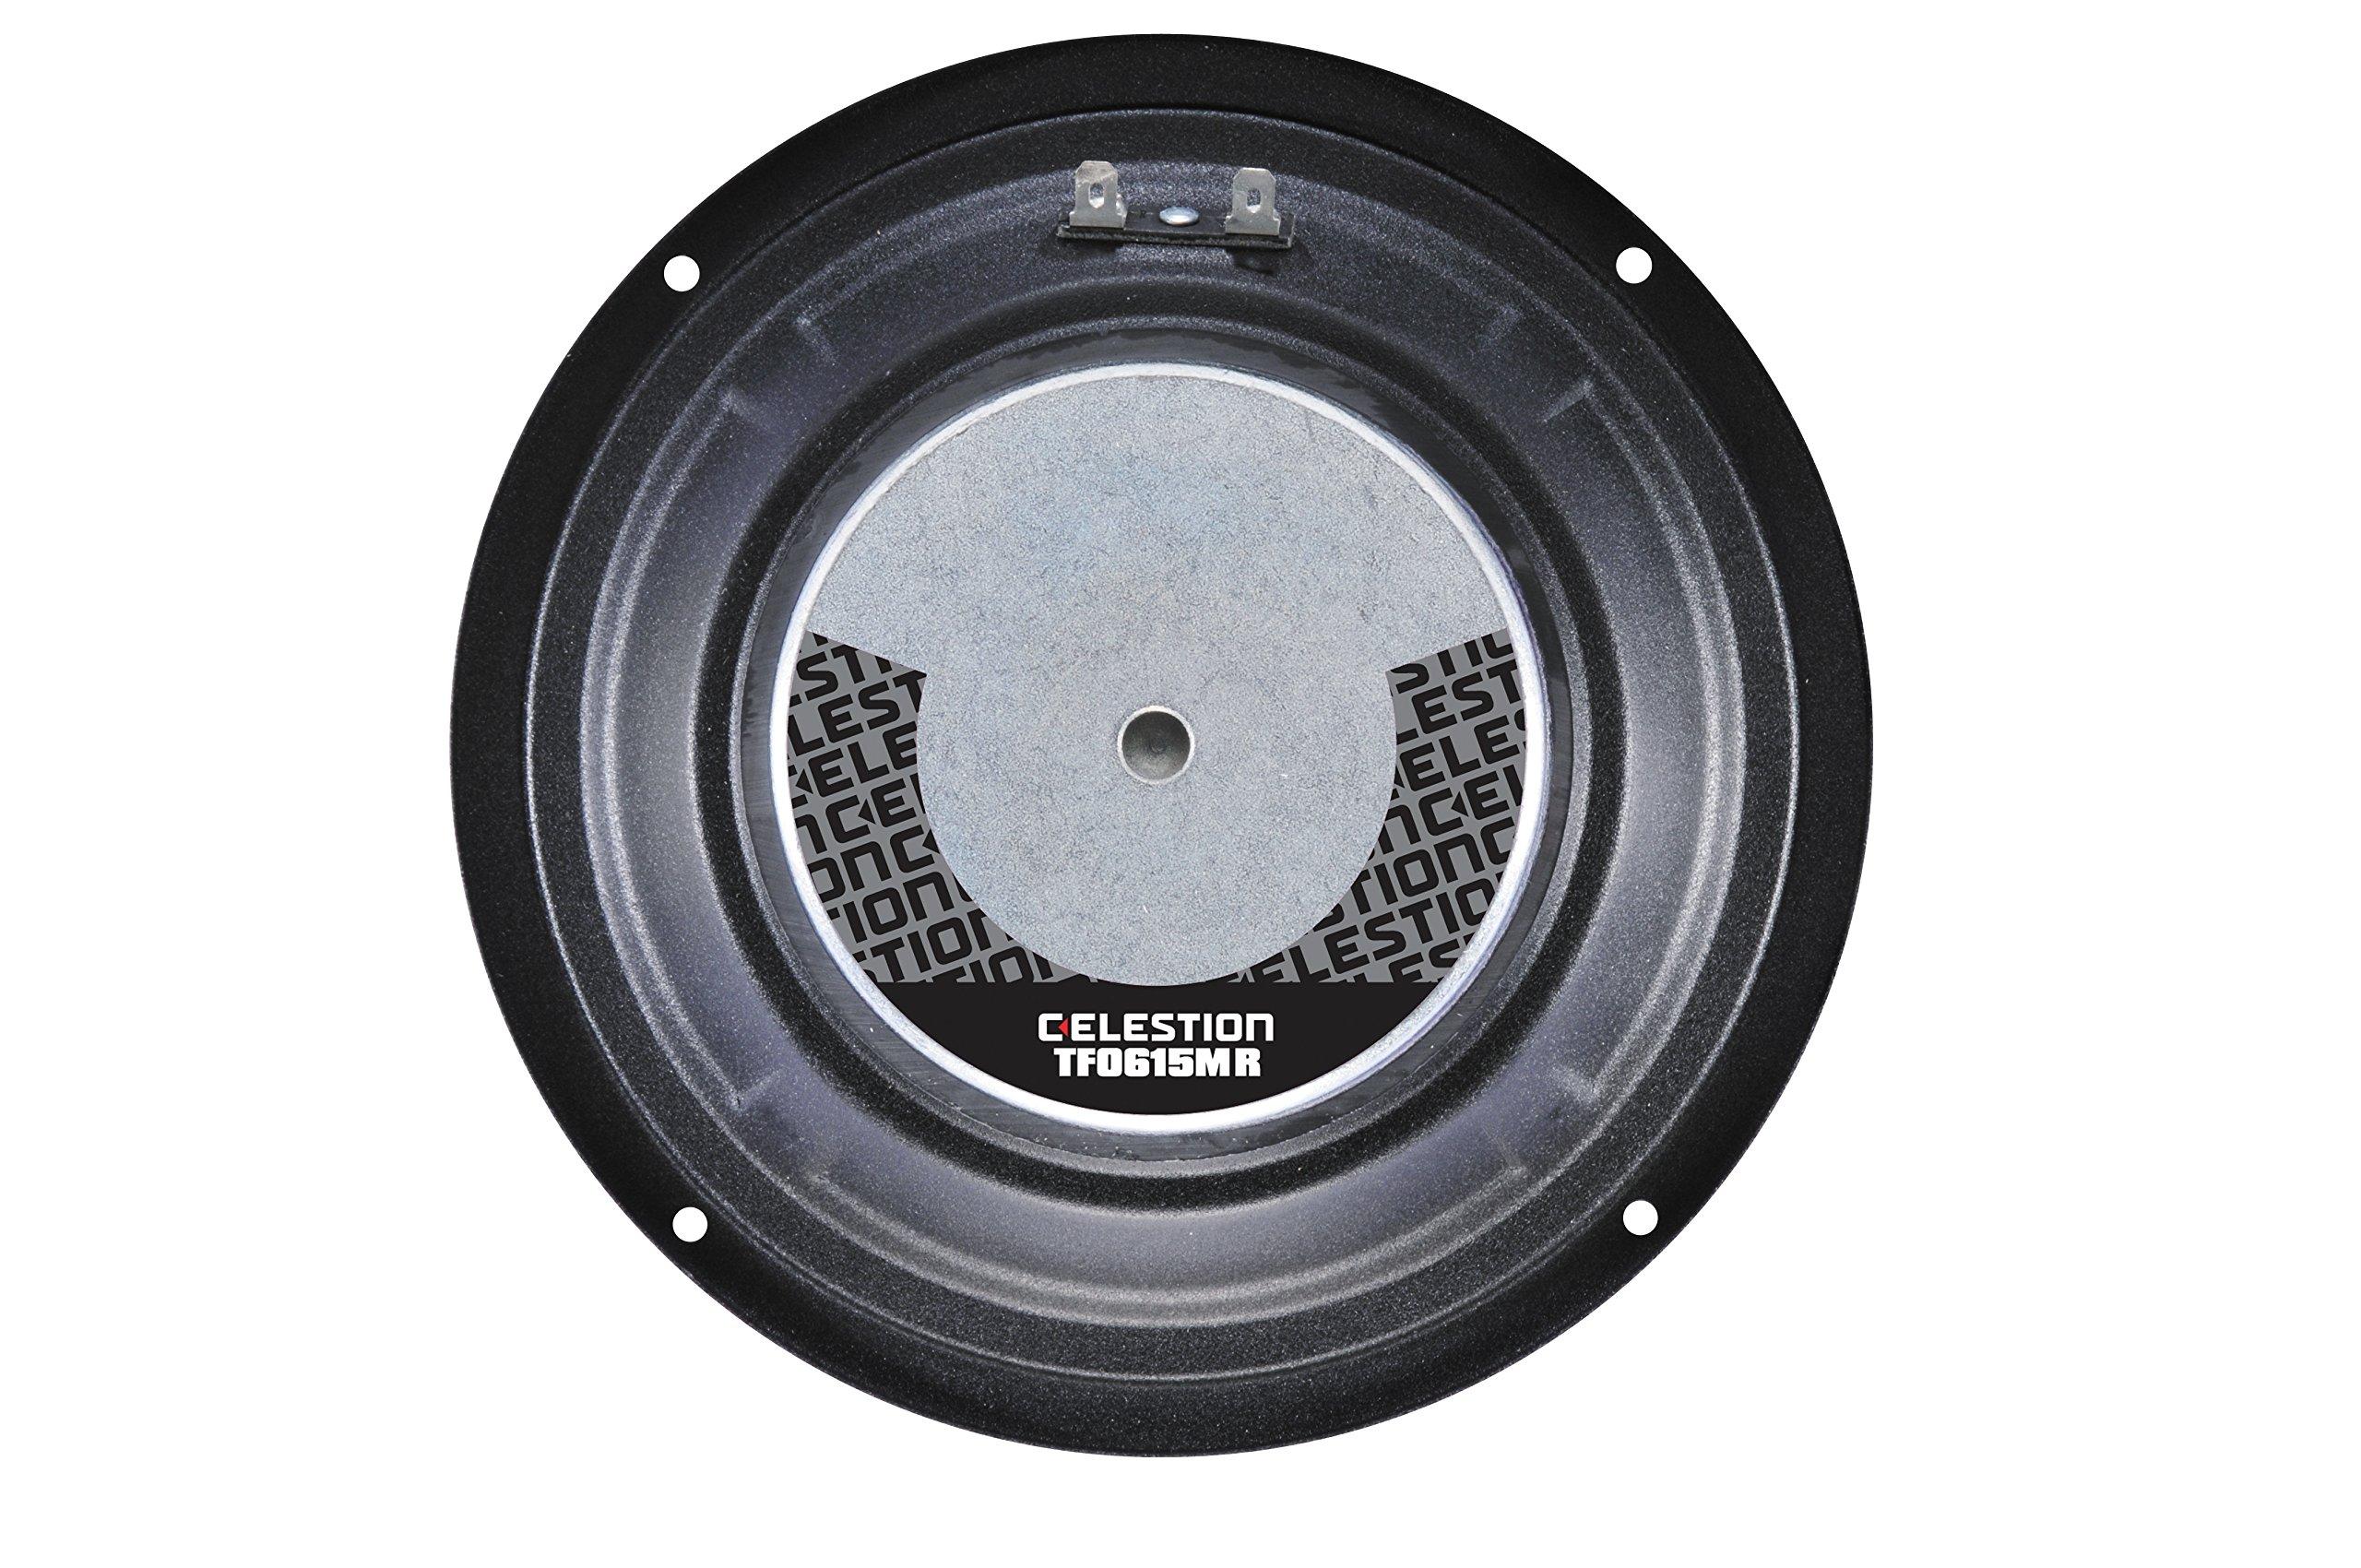 Celestion TF 0615MR 50 Watt Raw Frame Speaker, 8 Ohm, 6 inch